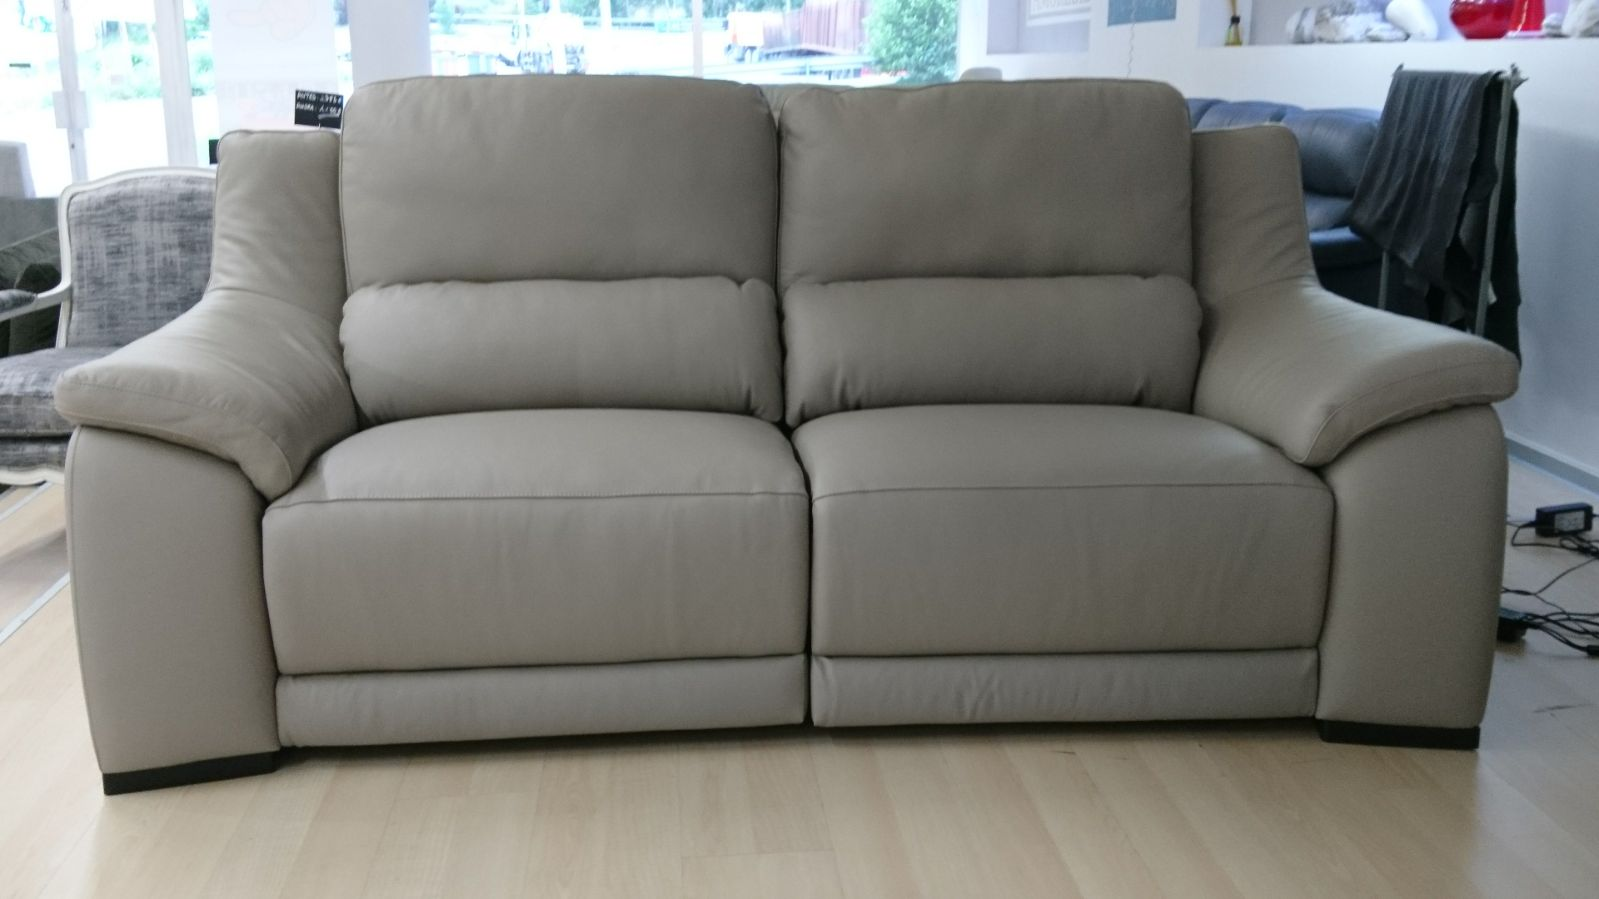 Muebles bizkaia sofas obtenga ideas dise o de muebles - Muebles segunda mano bizkaia ...